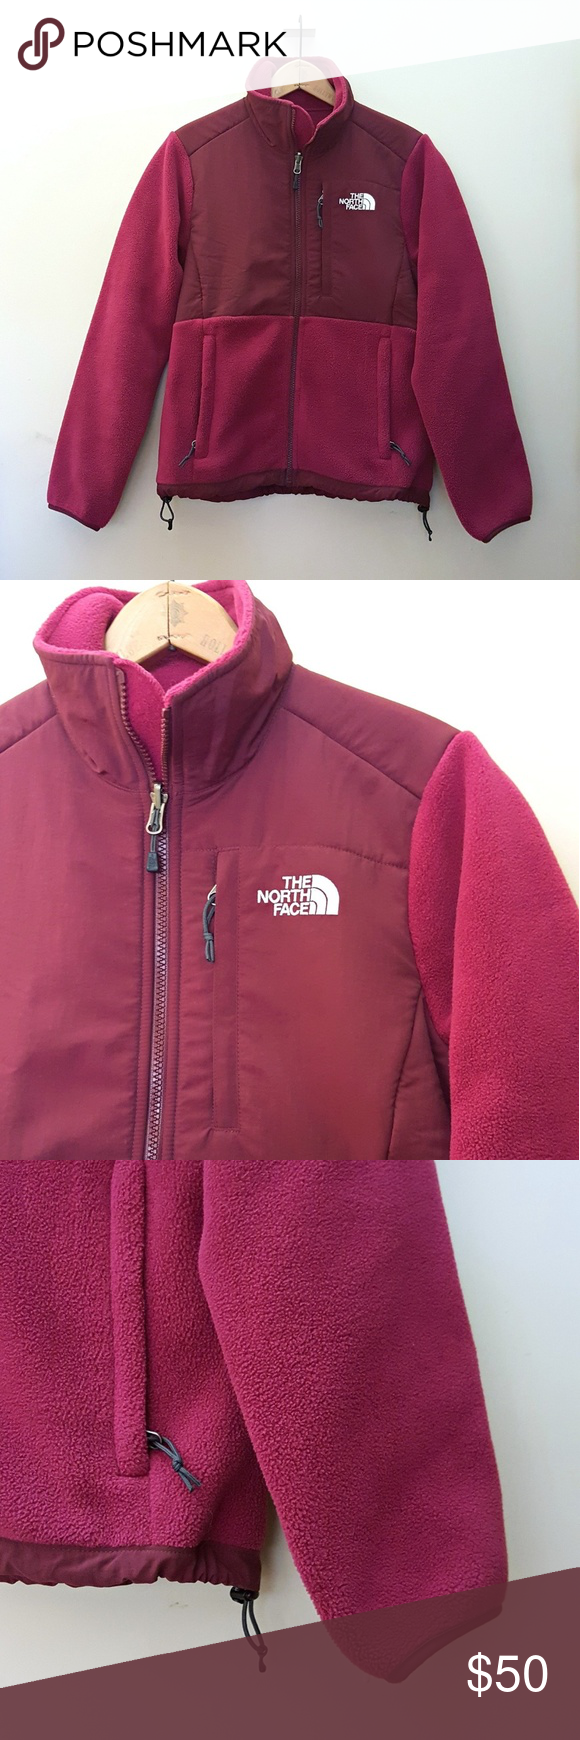 Sale North Face Denali Fleece Zip Up Jacket Jackets Fall Jackets Clothes Design [ 1740 x 580 Pixel ]